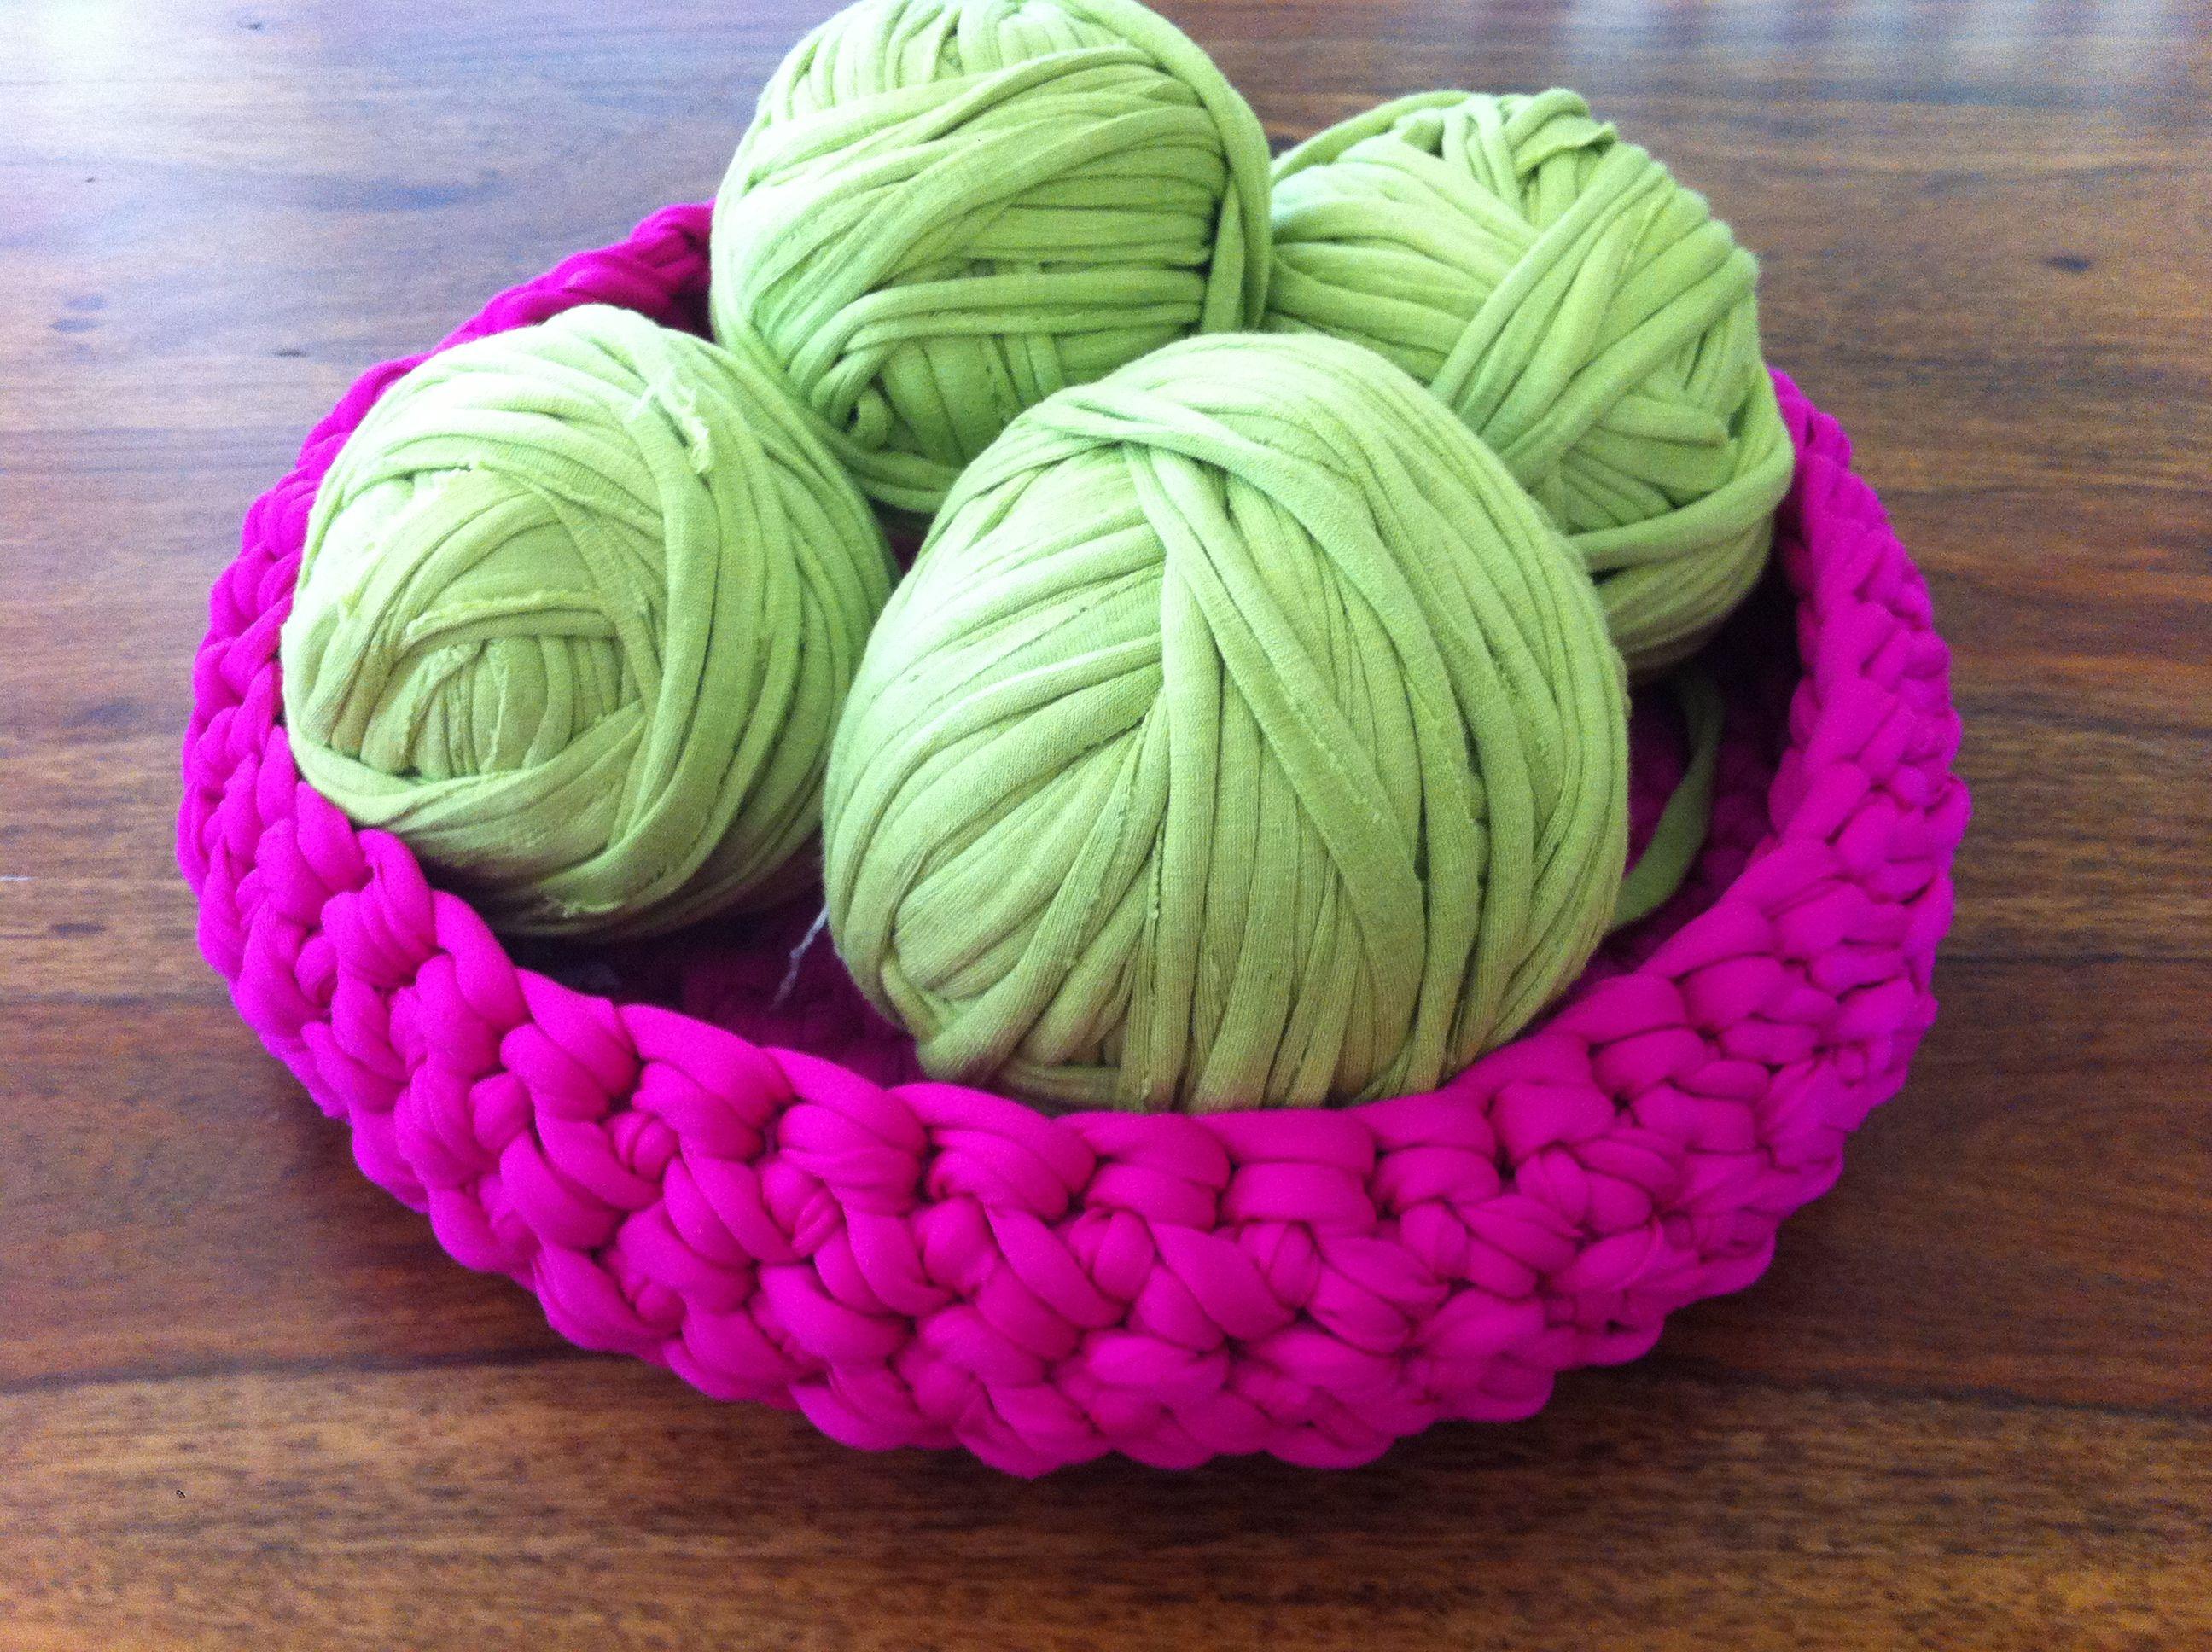 Pin by Blogalini on My Crochet designs Crochet designs